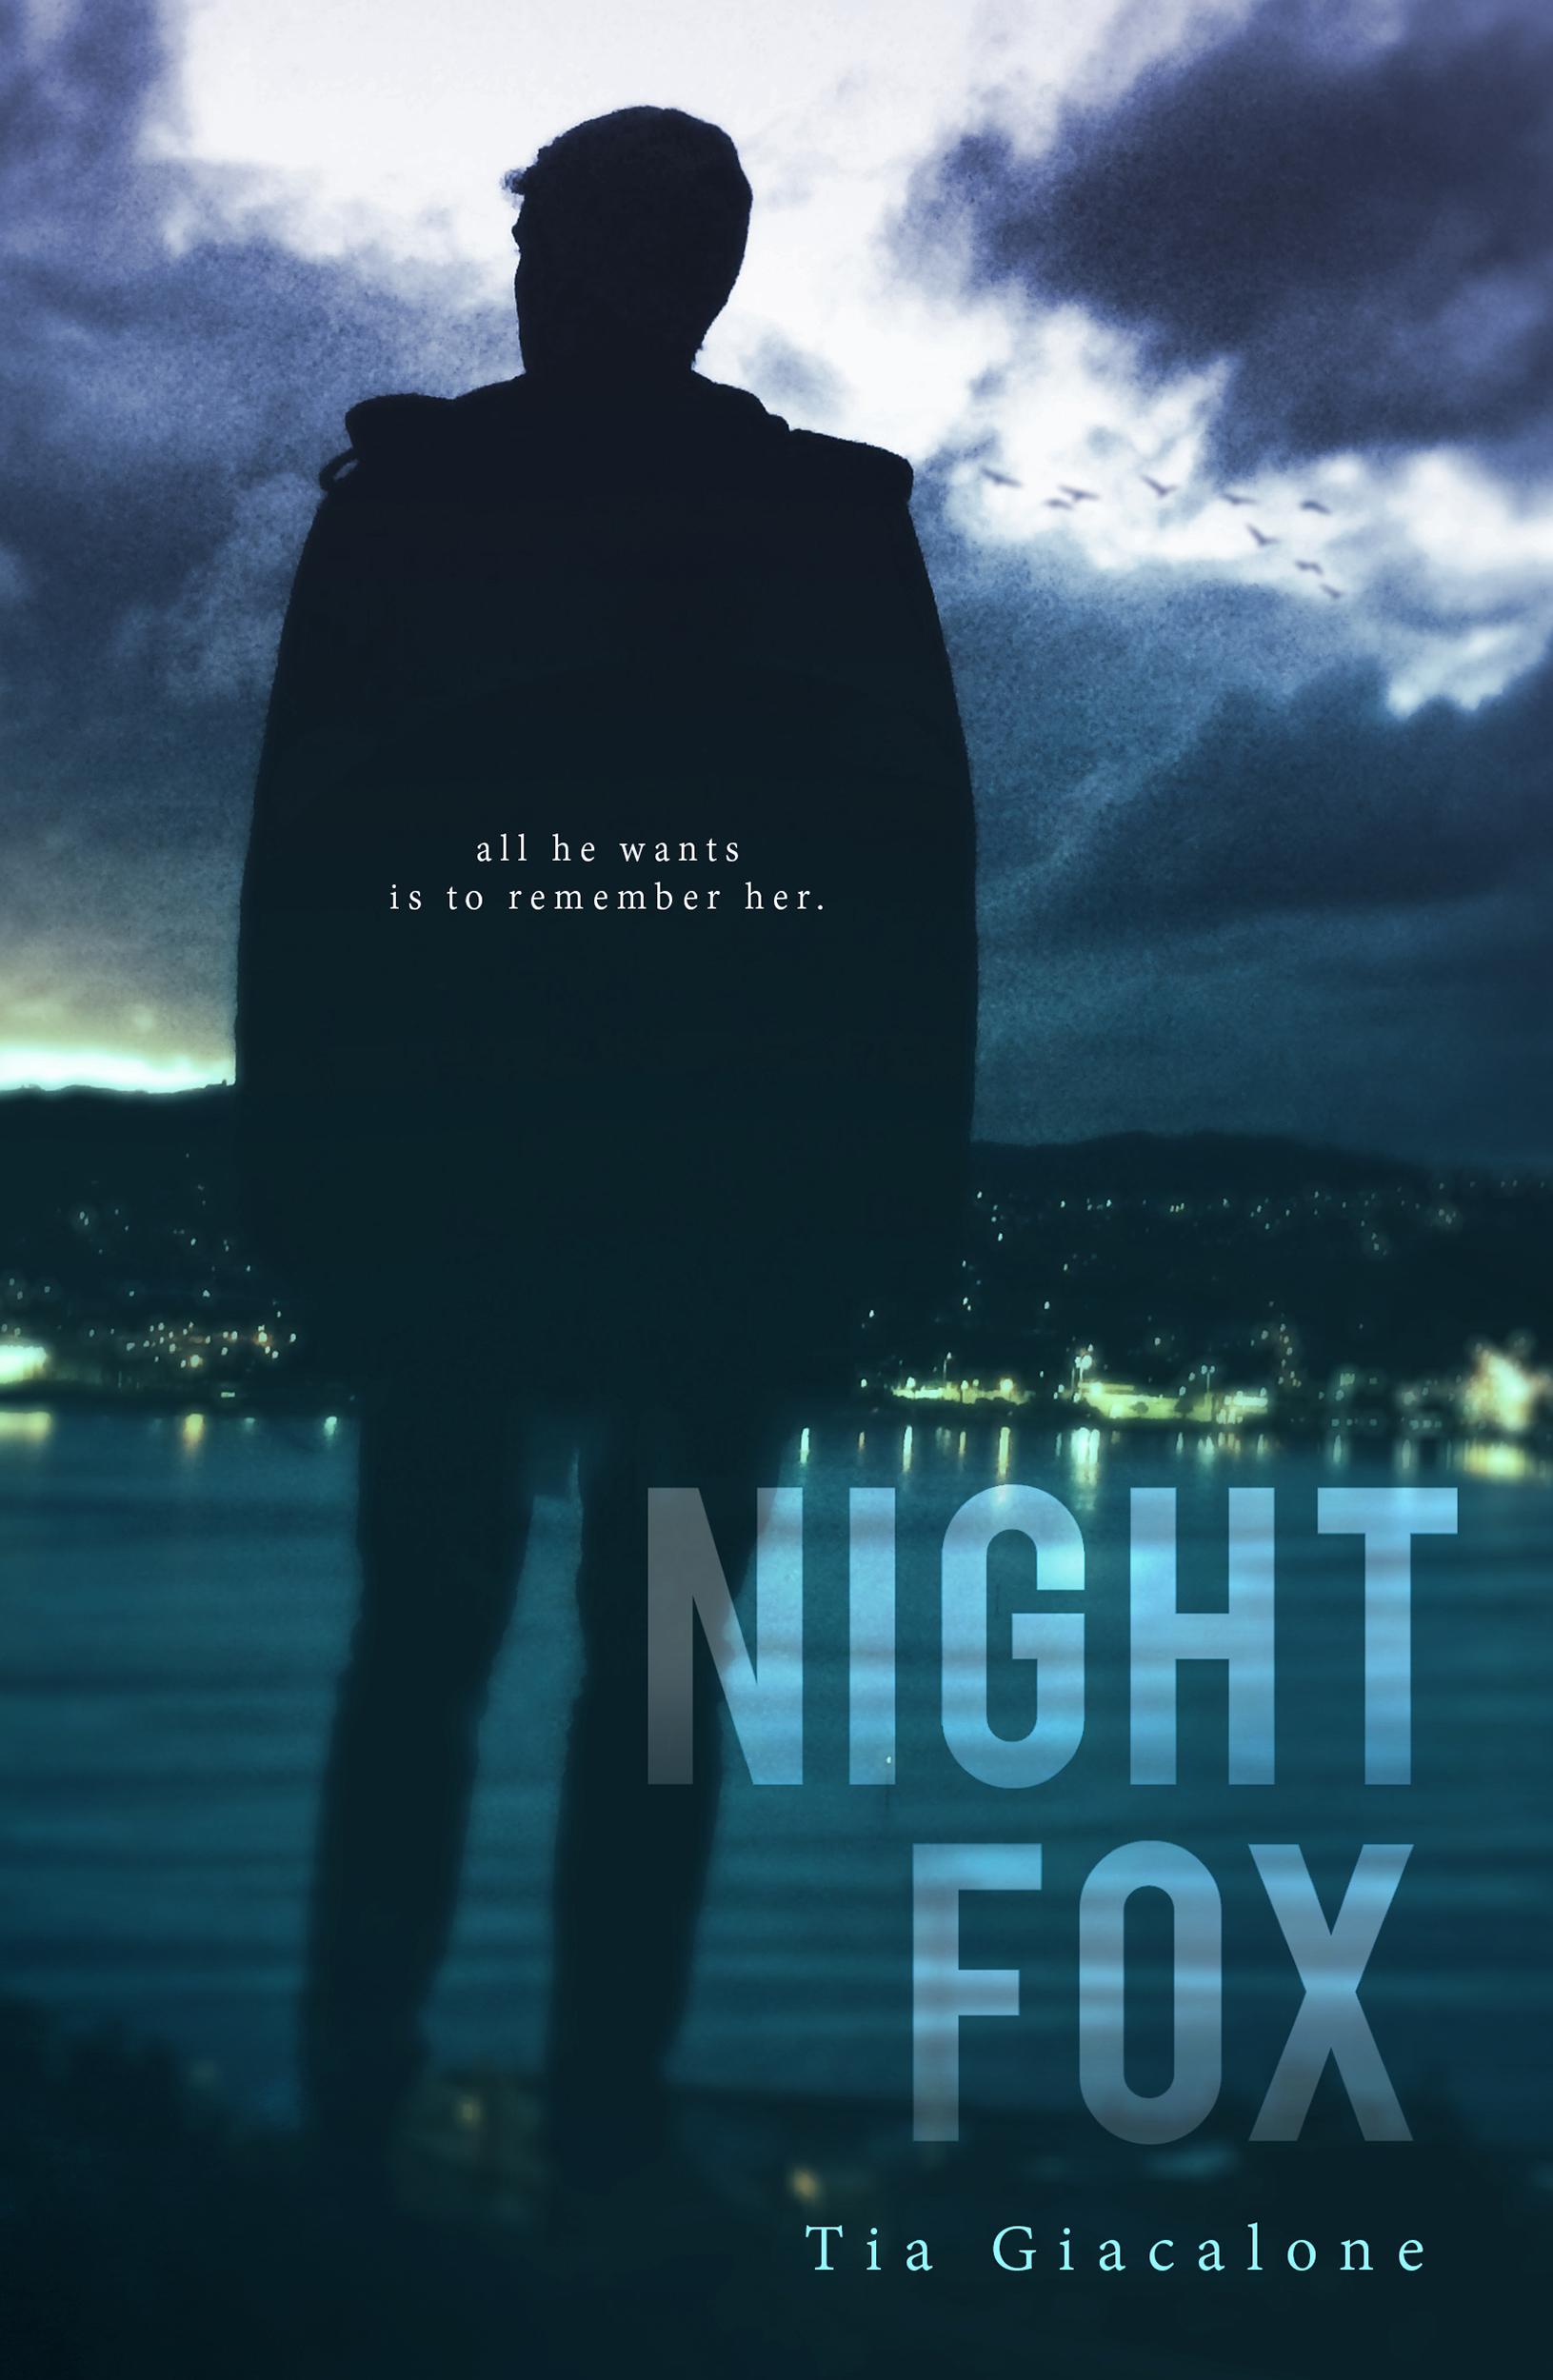 Night Fox by Tia Giacalone